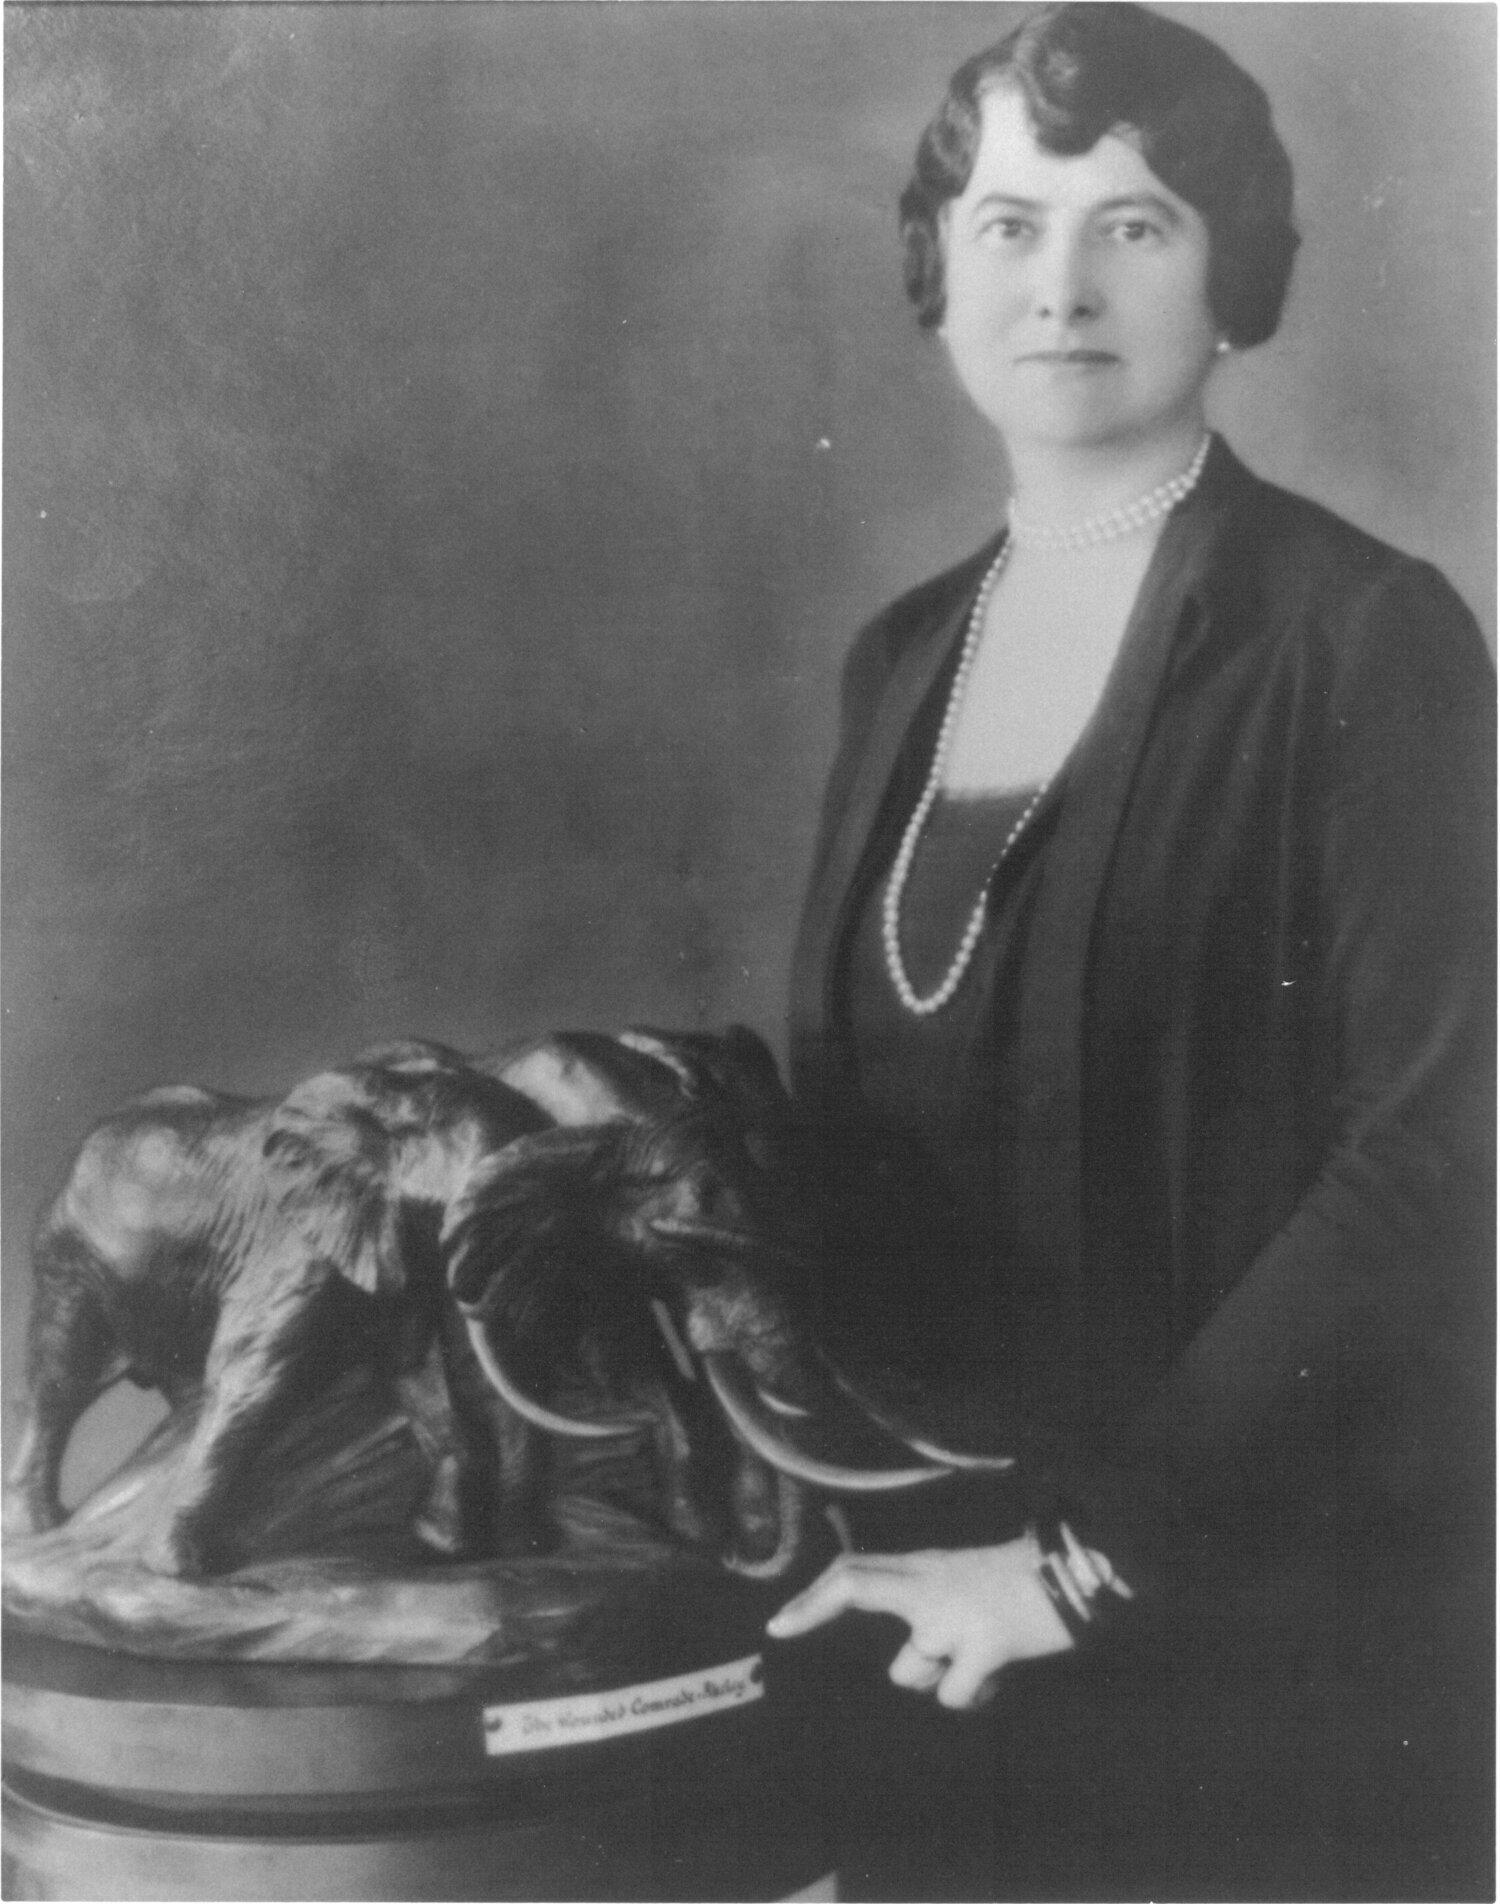 Photograph of Mary Jobe Akeley